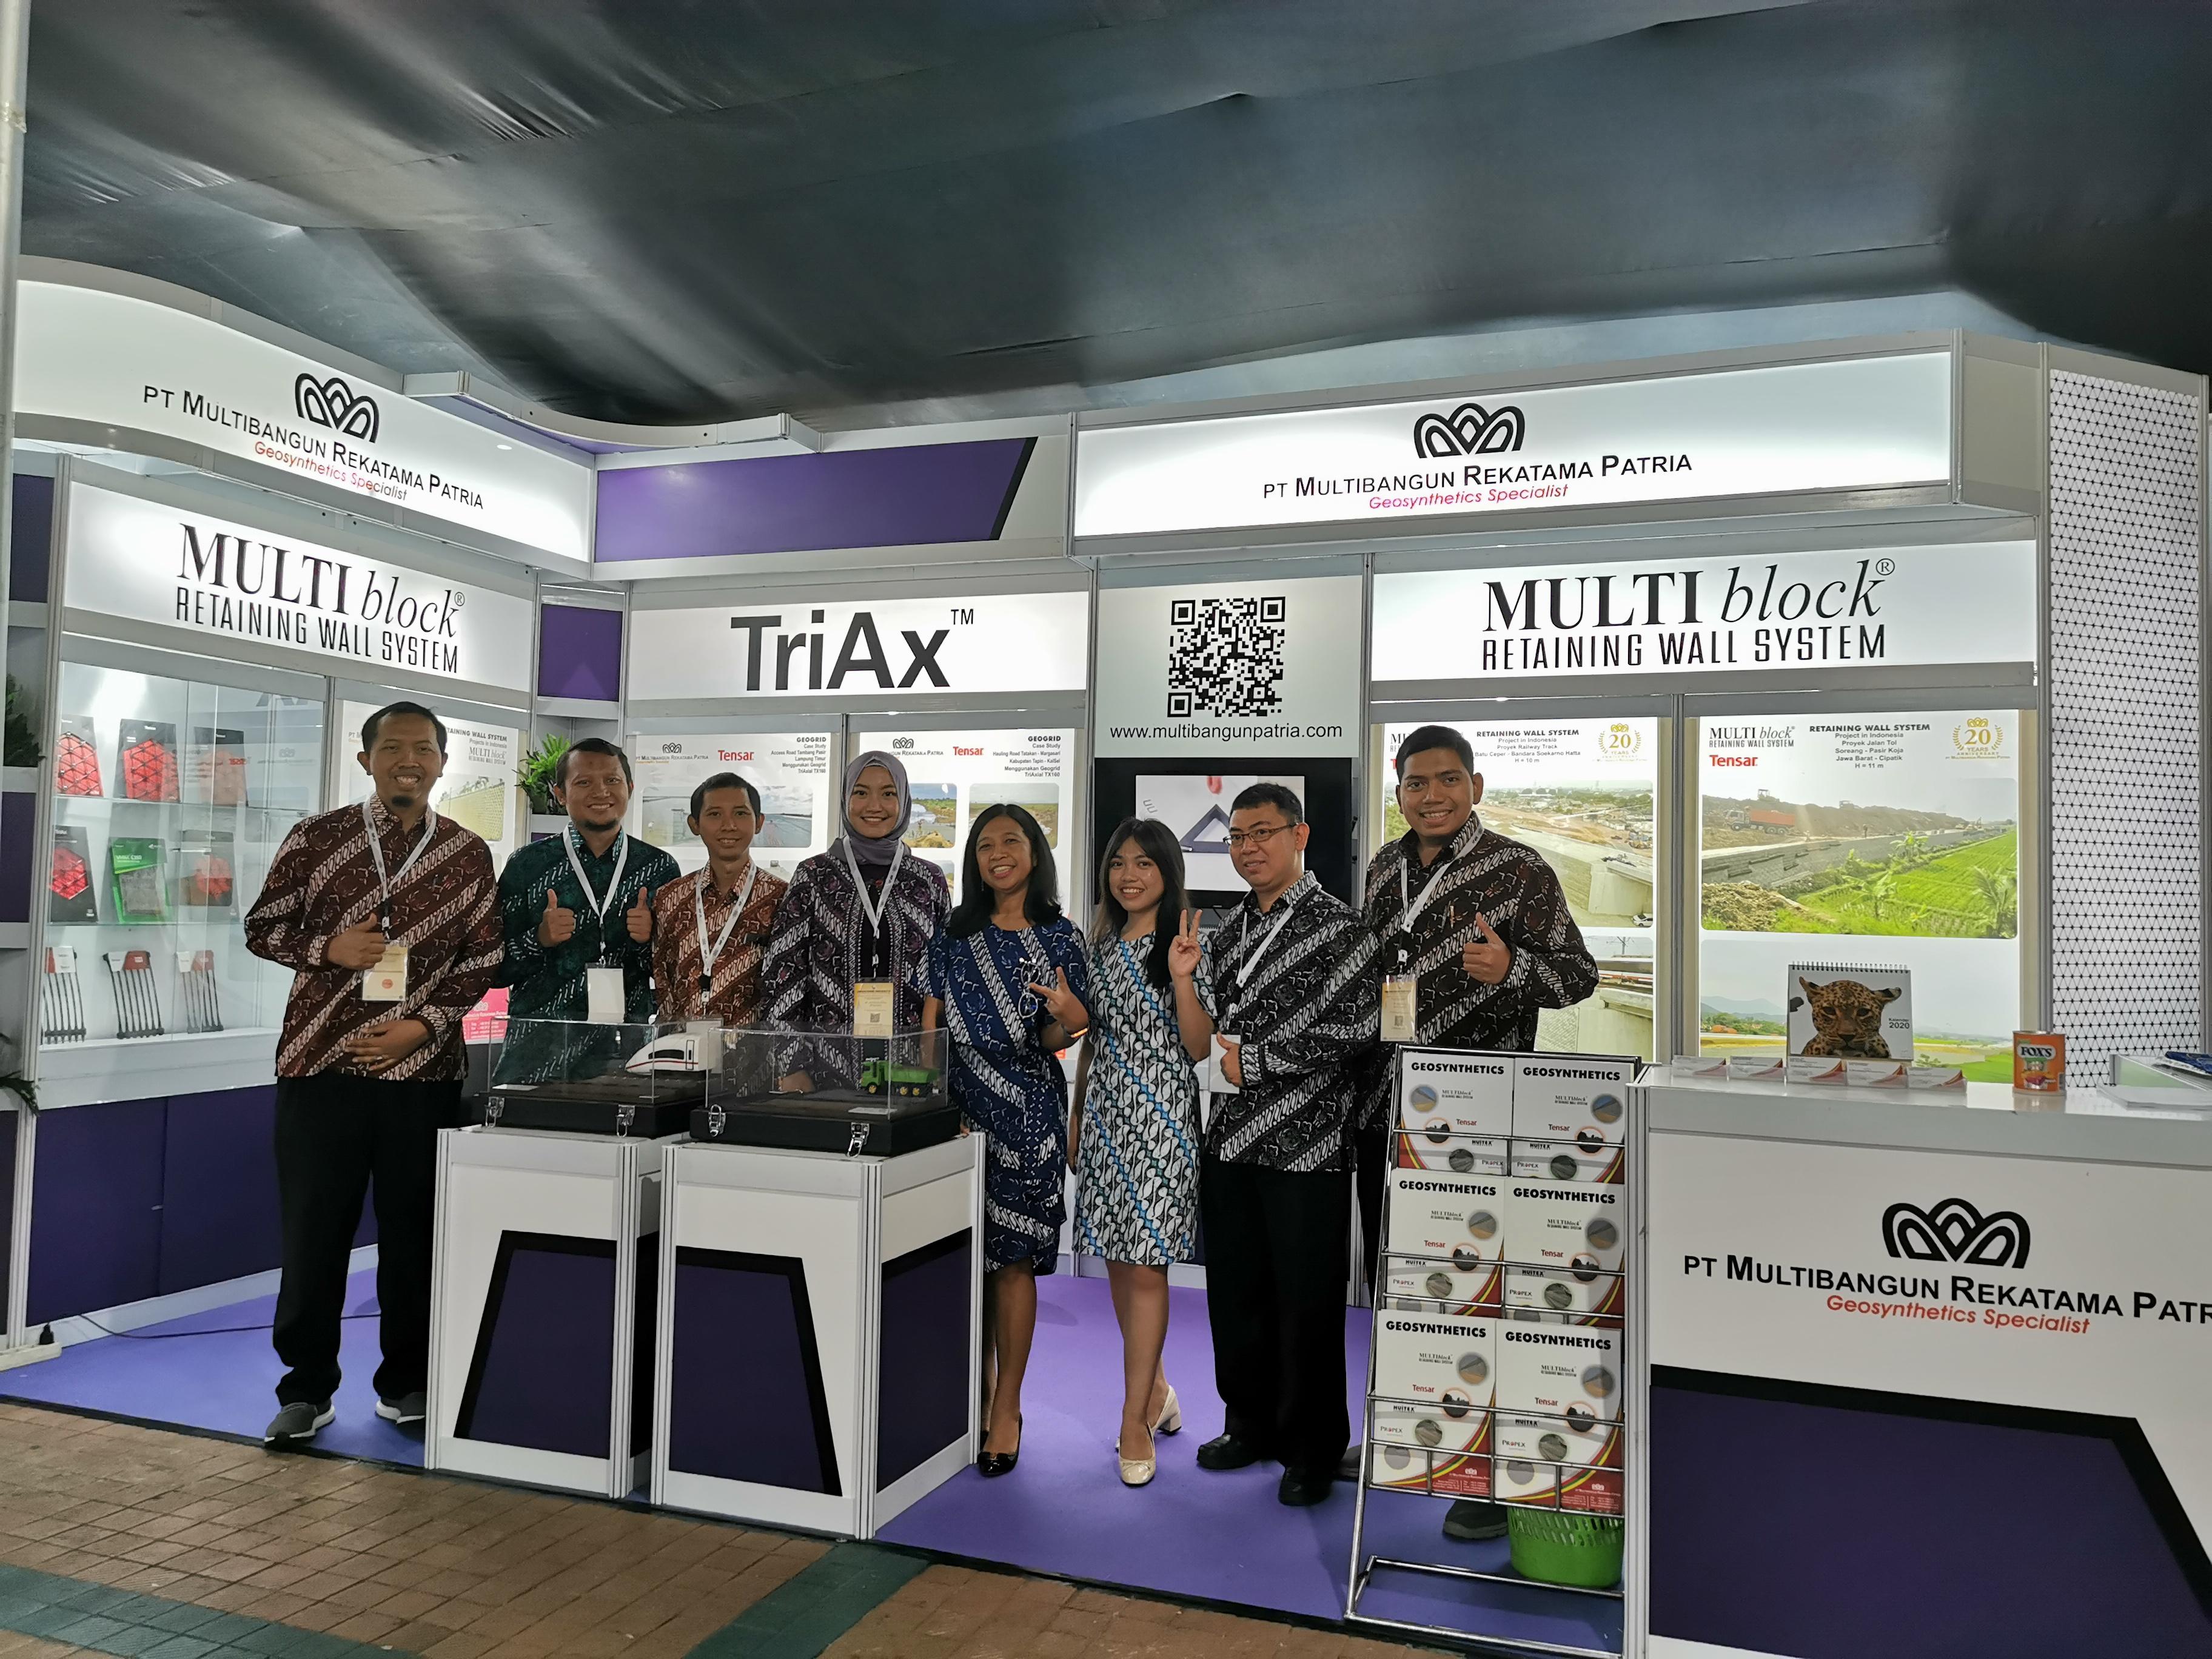 PT. Multibangun Rekatam Patria Pameran KNTJ Ke X 2019